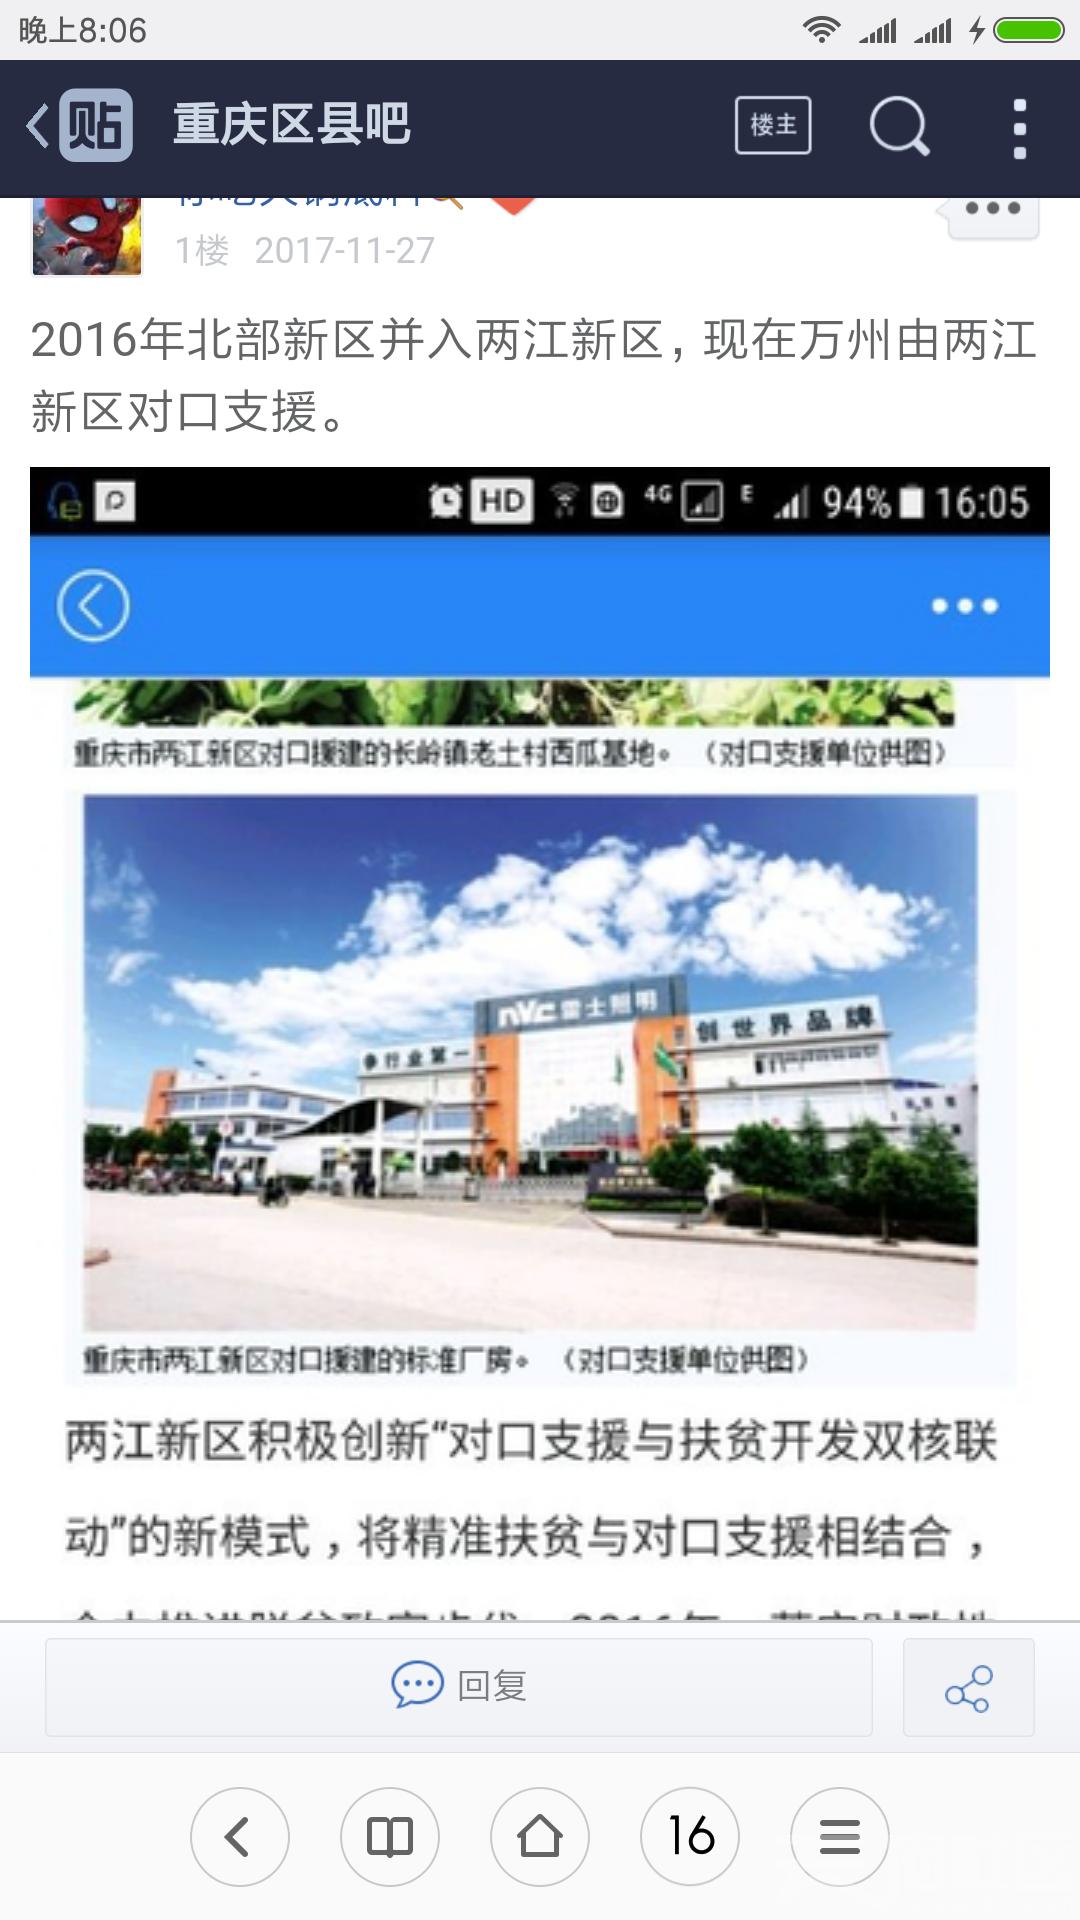 Screenshot_2018-01-07-20-06-46-604_com.android.browser.png